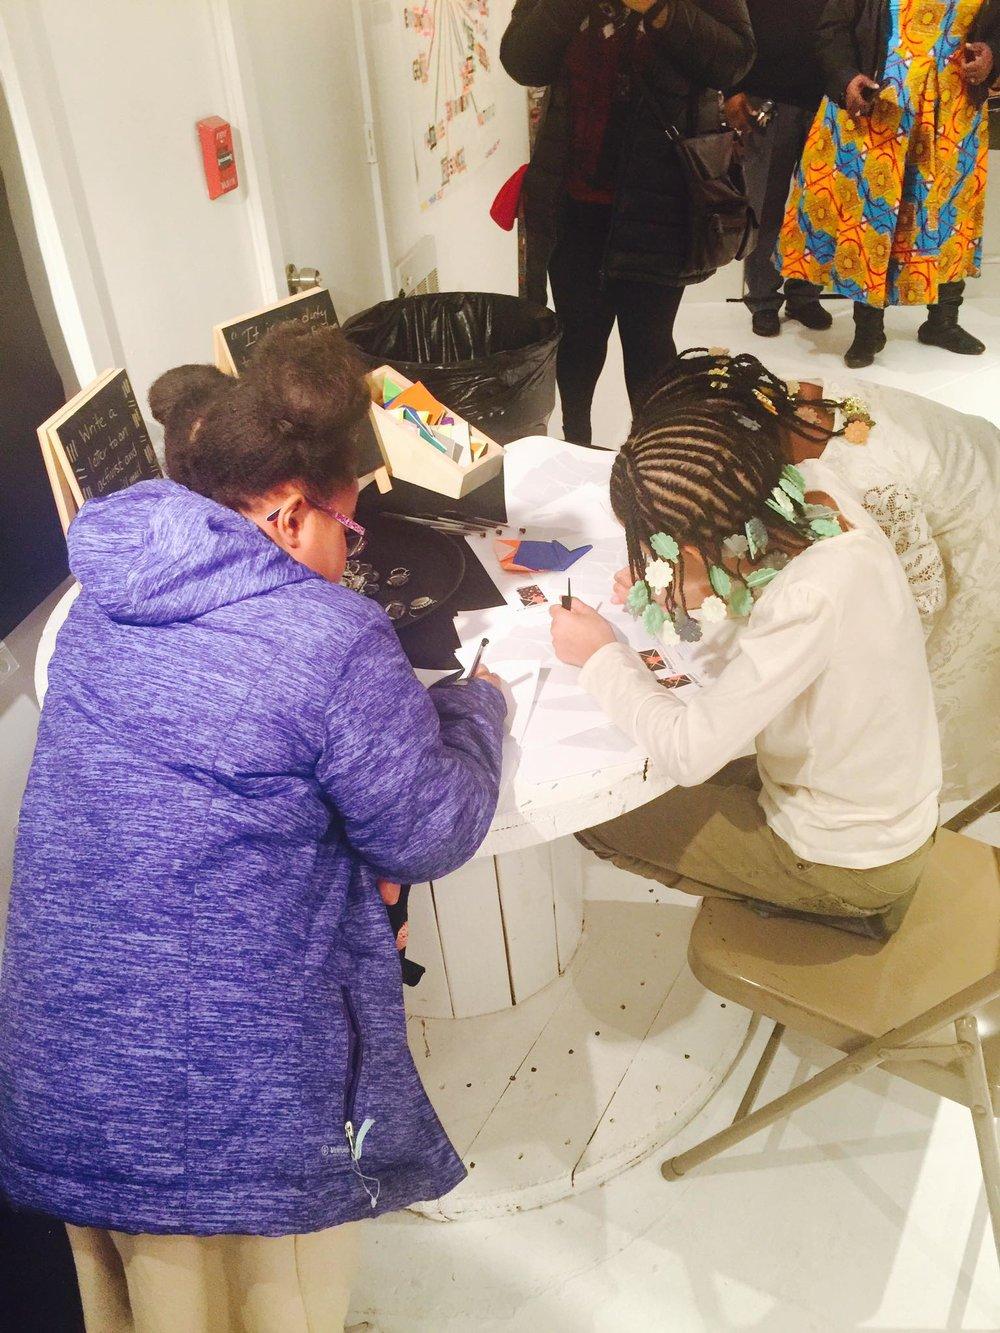 Upstanders Stars Mentoring art making - Copy.jpg